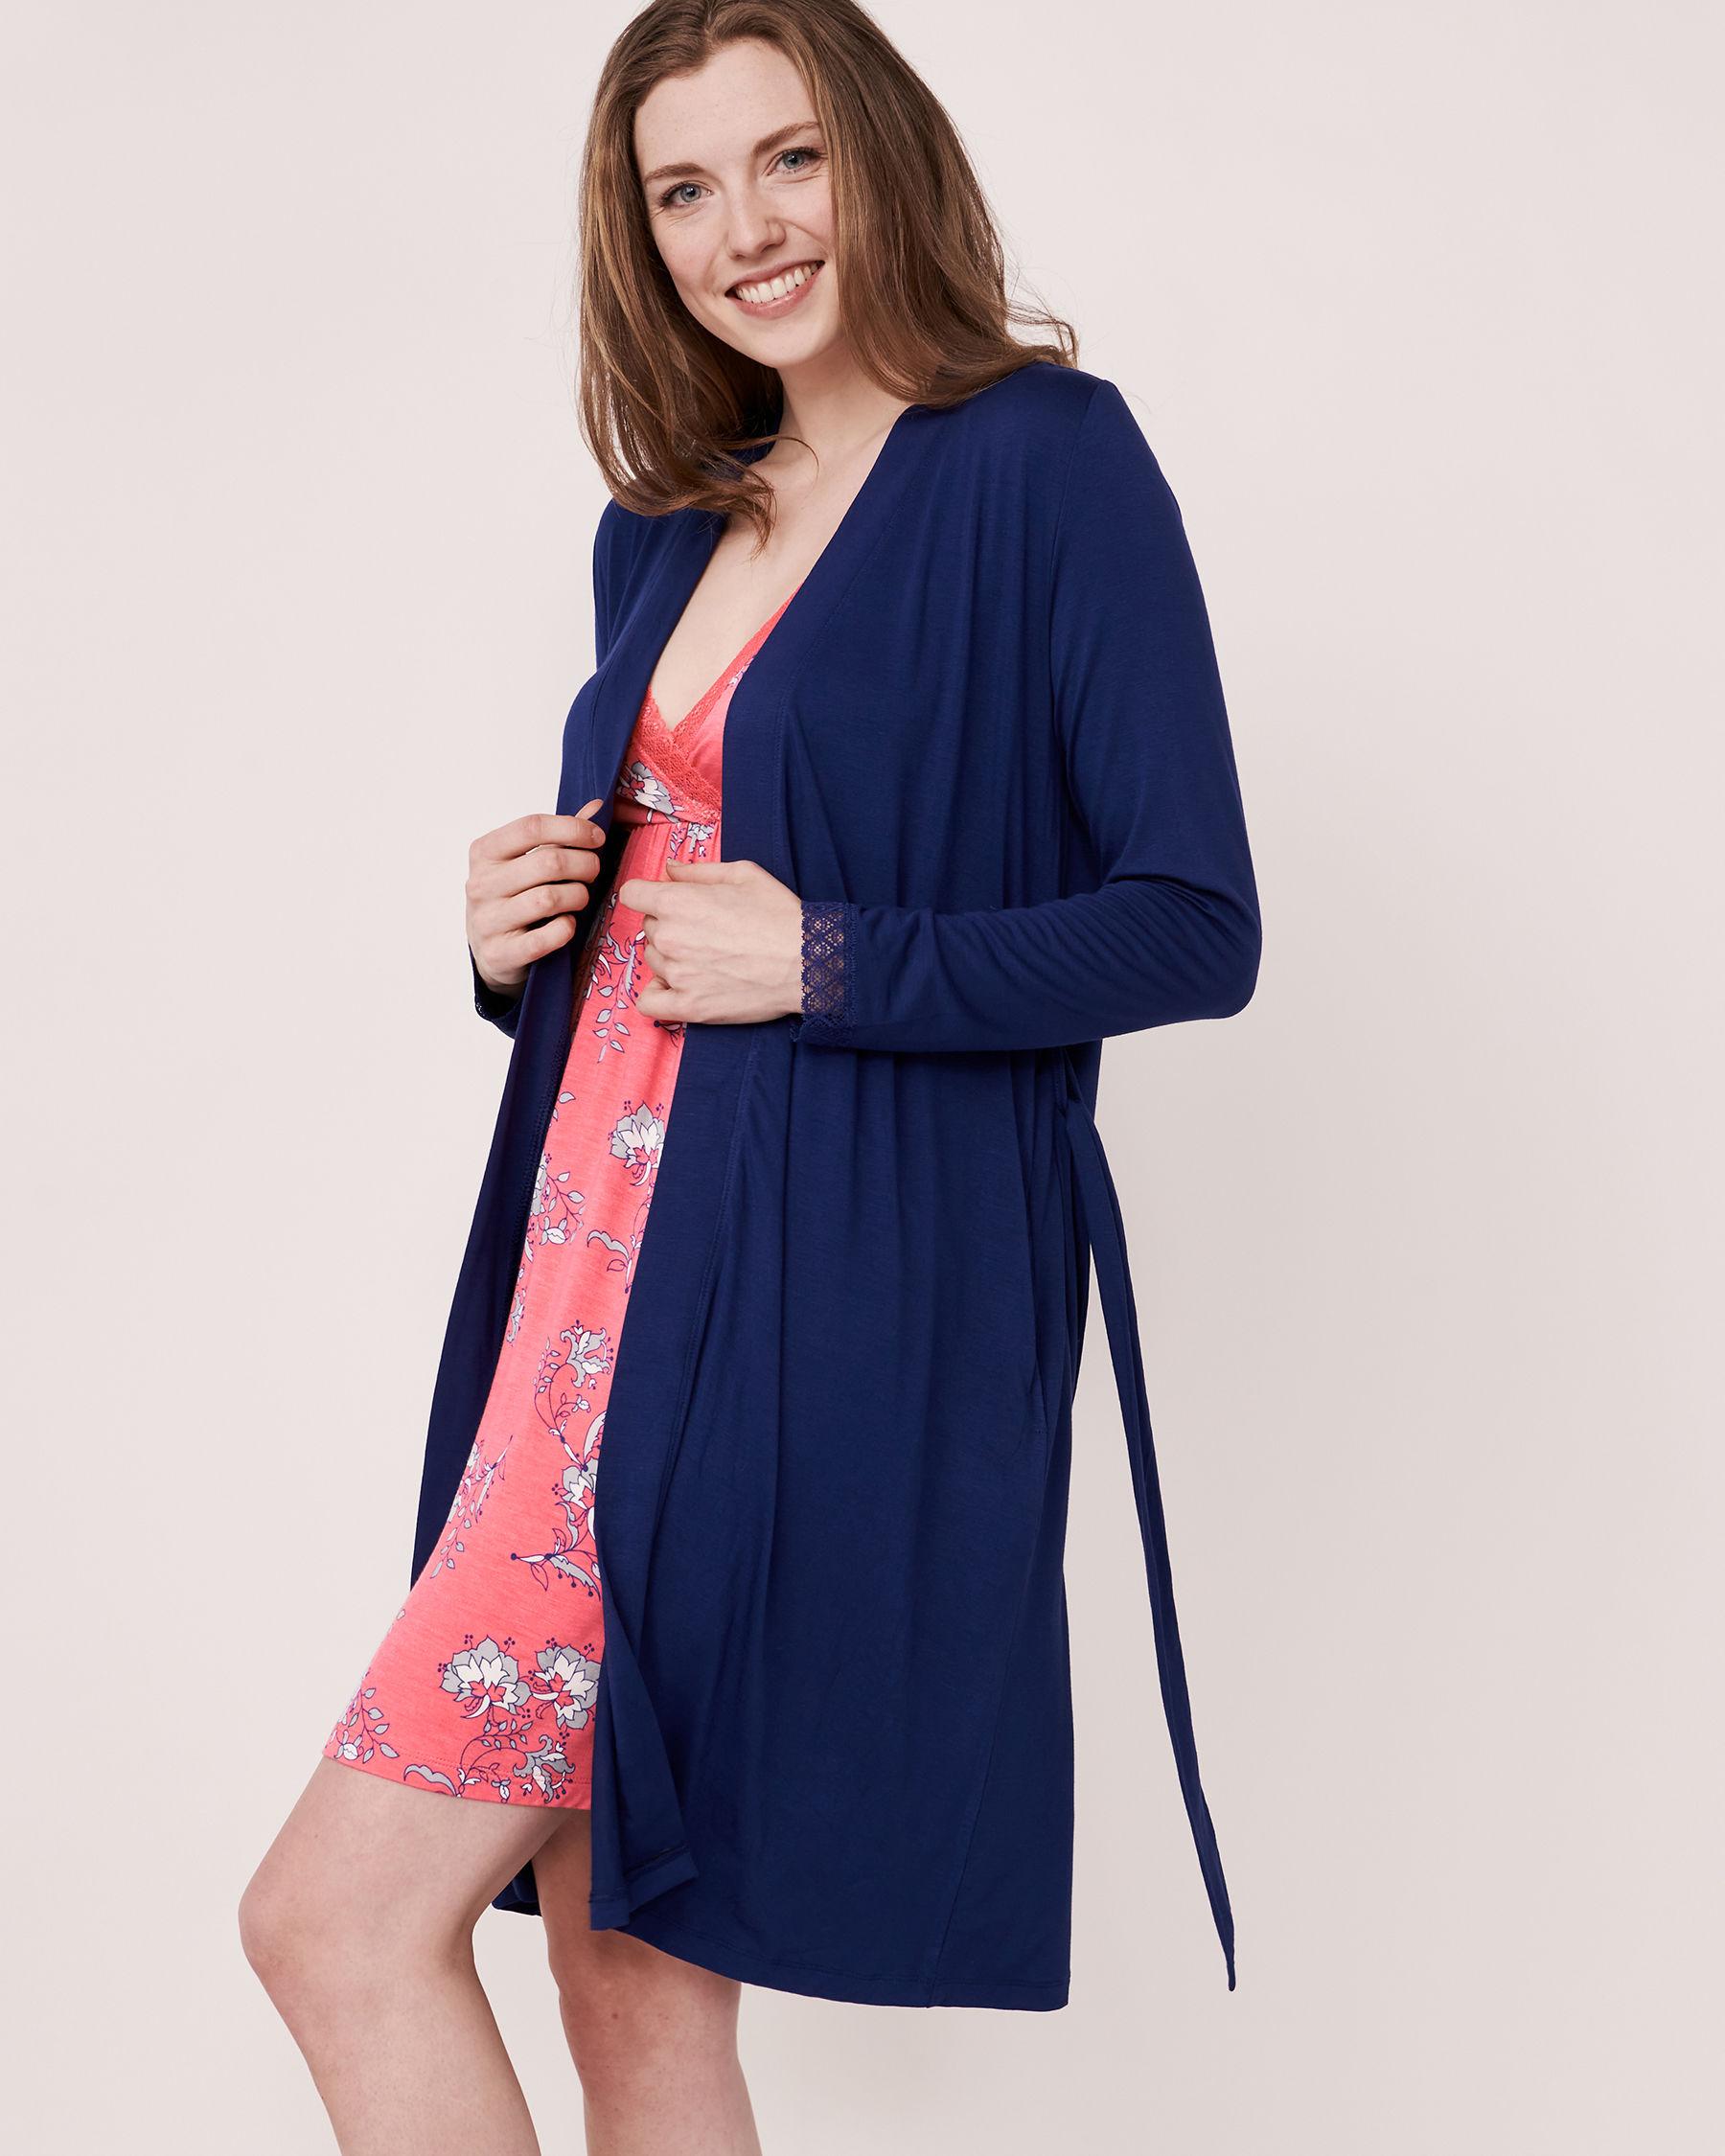 LA VIE EN ROSE Lace Trim Robe Blue 40600006 - View2